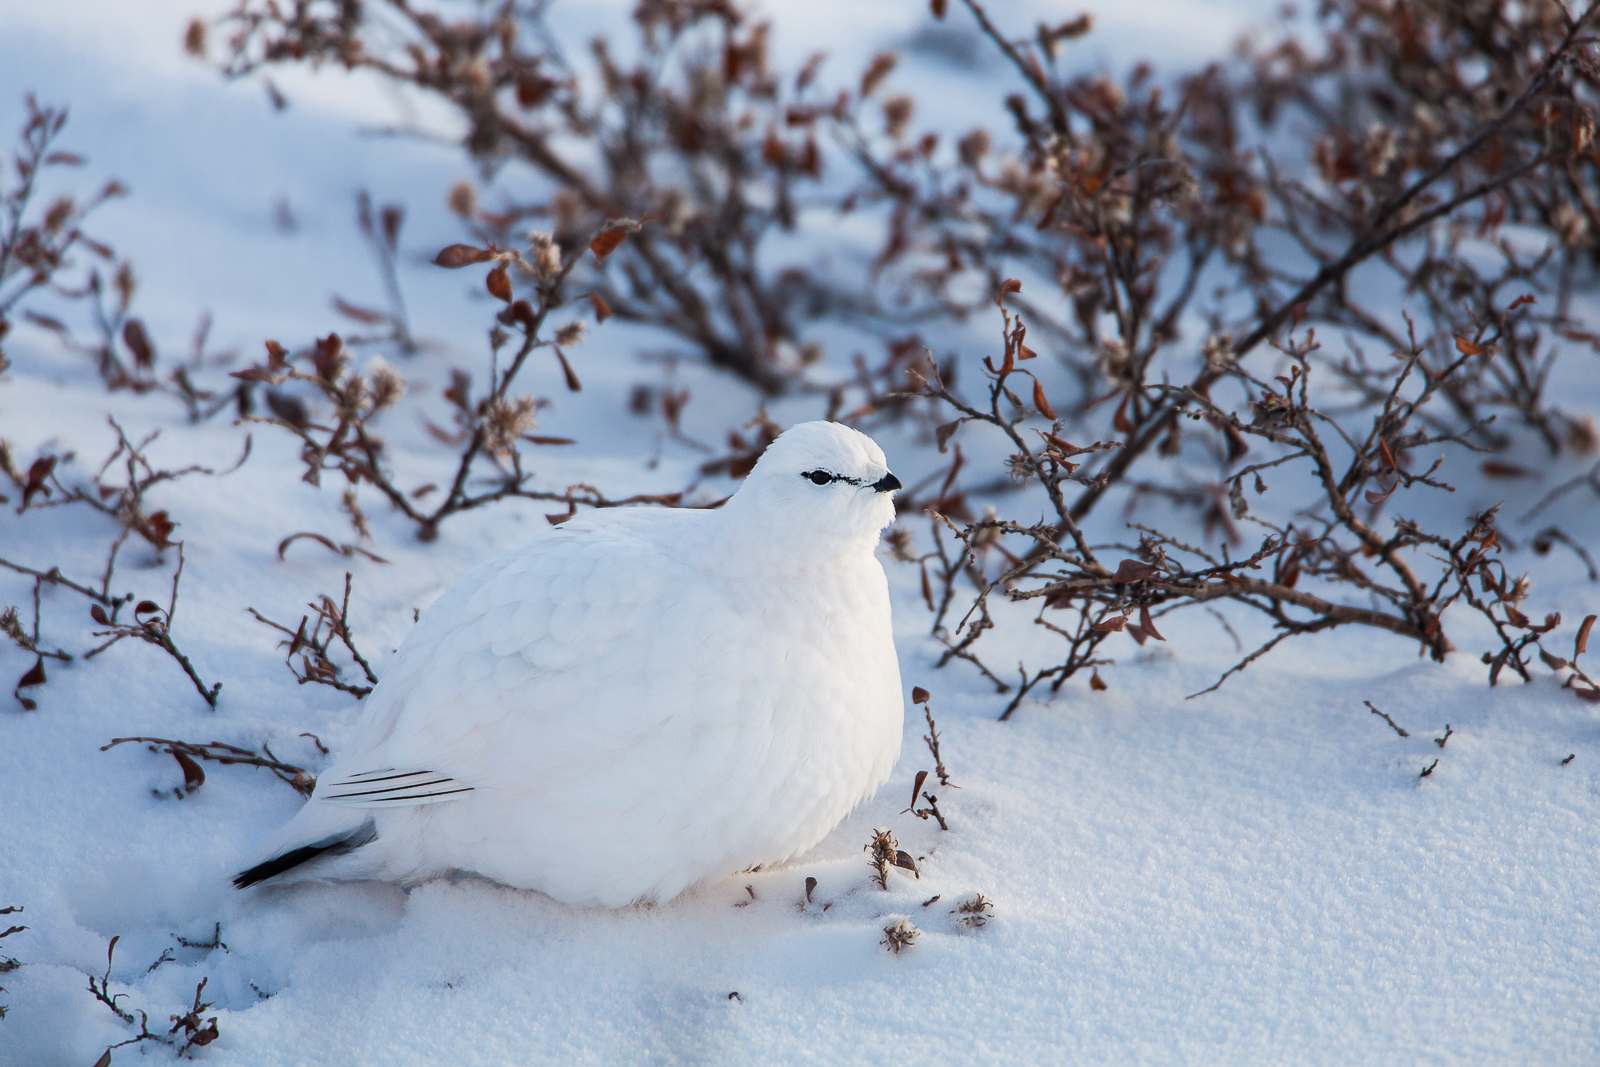 Snowball,Snow,Stock,Wildlife,Willow Ptarmigan,plumage,Horizontal,Gray, photo